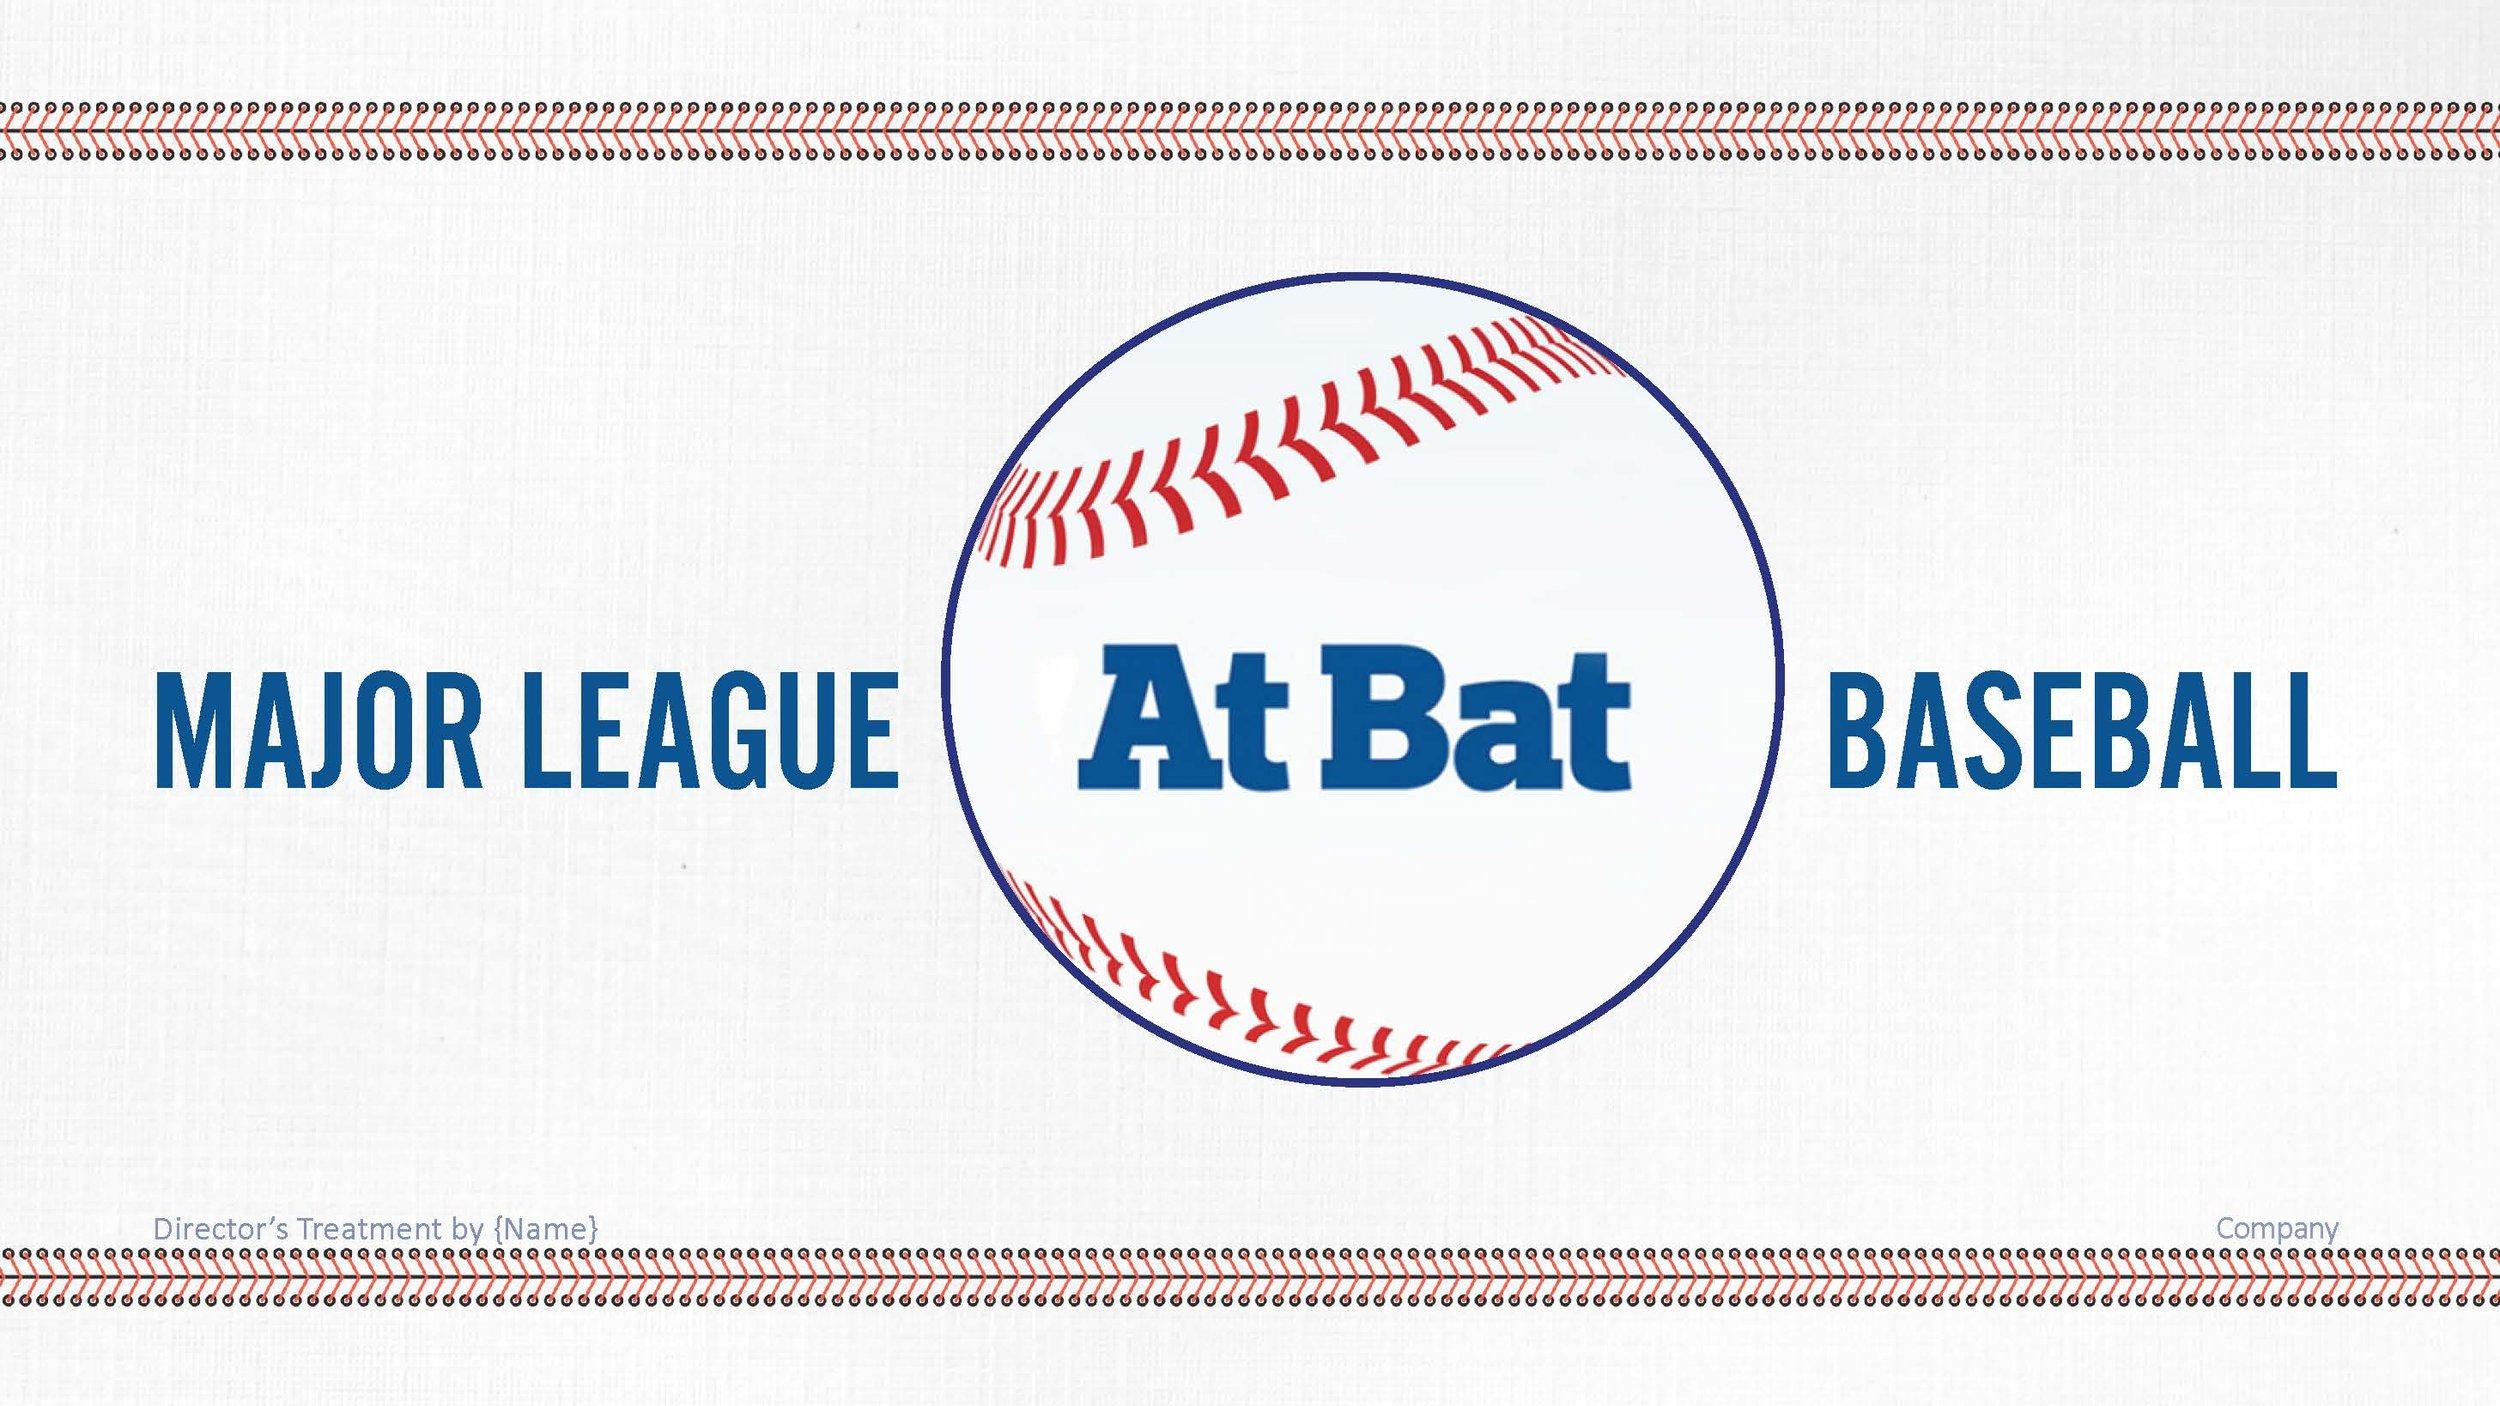 RGiannotti _ Layout Porfolio _ Summer18 _ V3 _ add ADIDAS and MLB_Page_11.jpg